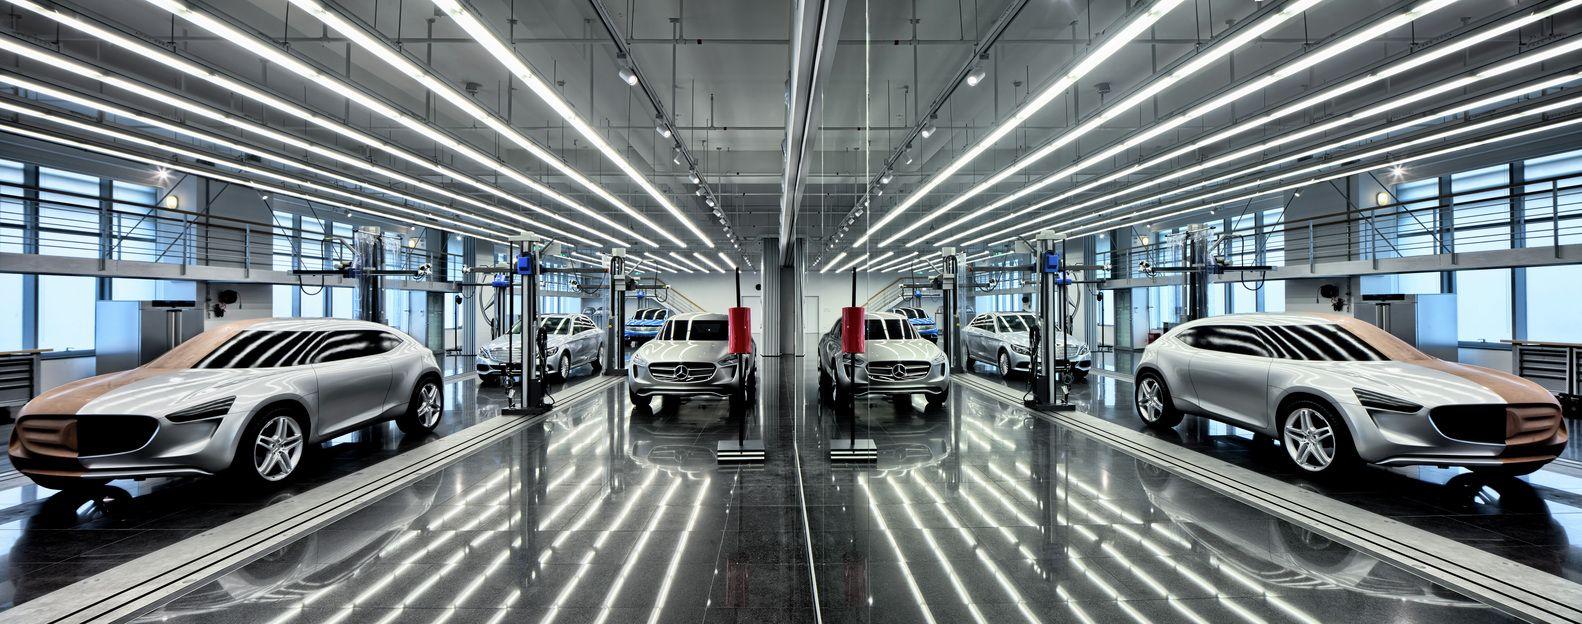 Gallery of MercedesBenz Advanced Design Center of China